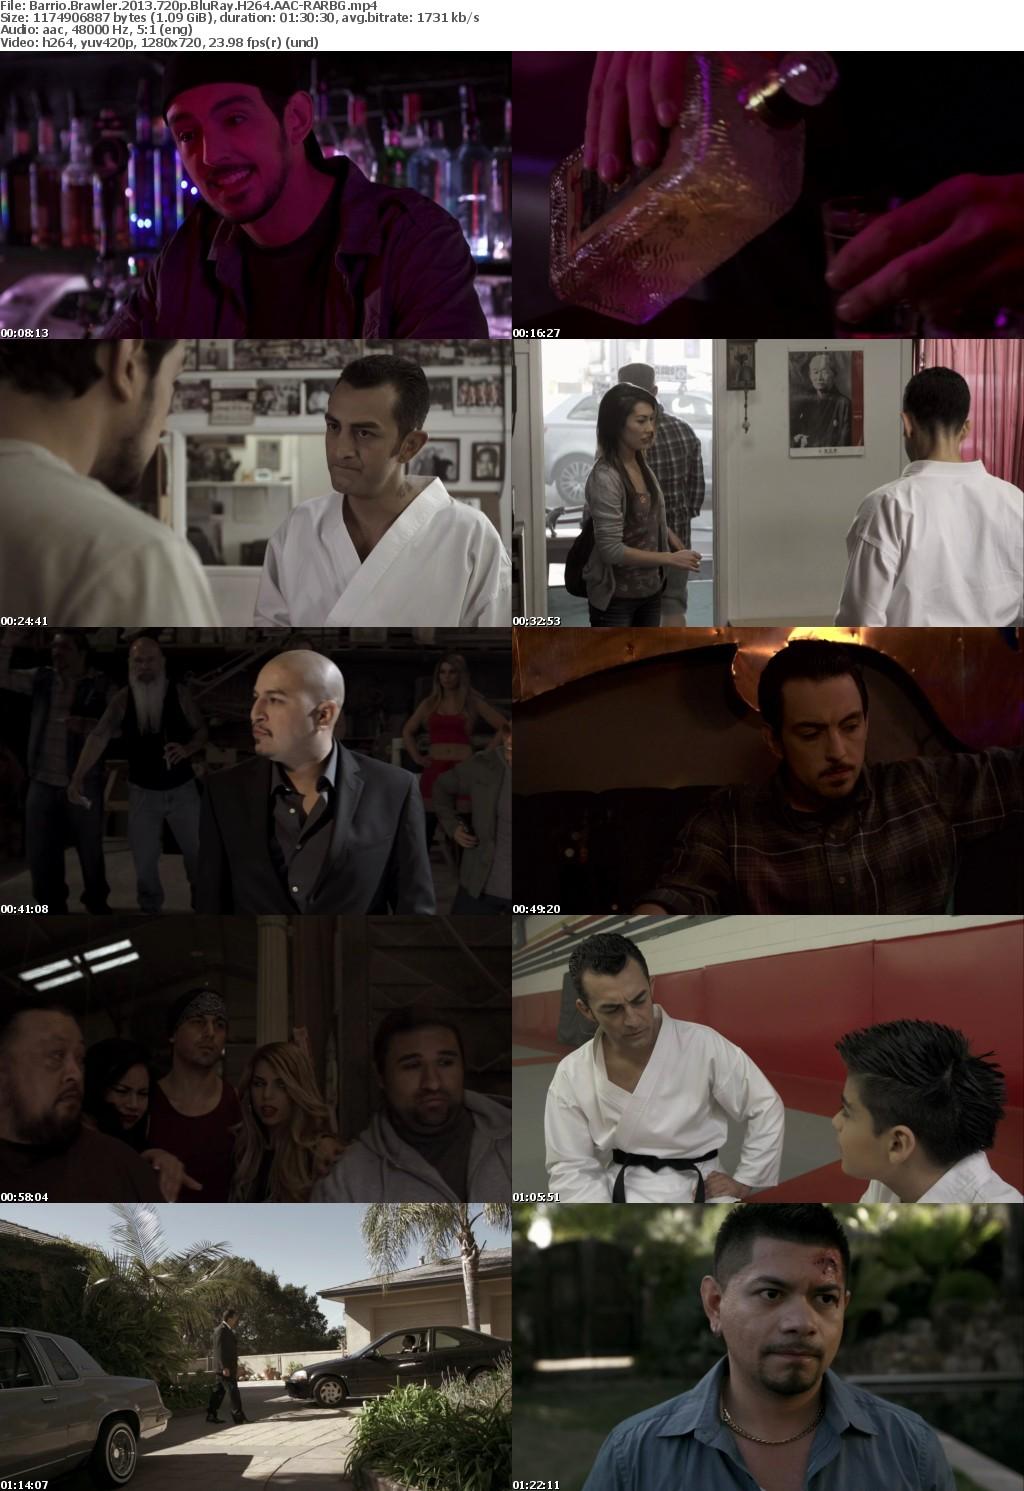 Barrio Brawler (2013) 720p BluRay H264 AAC-RARBG